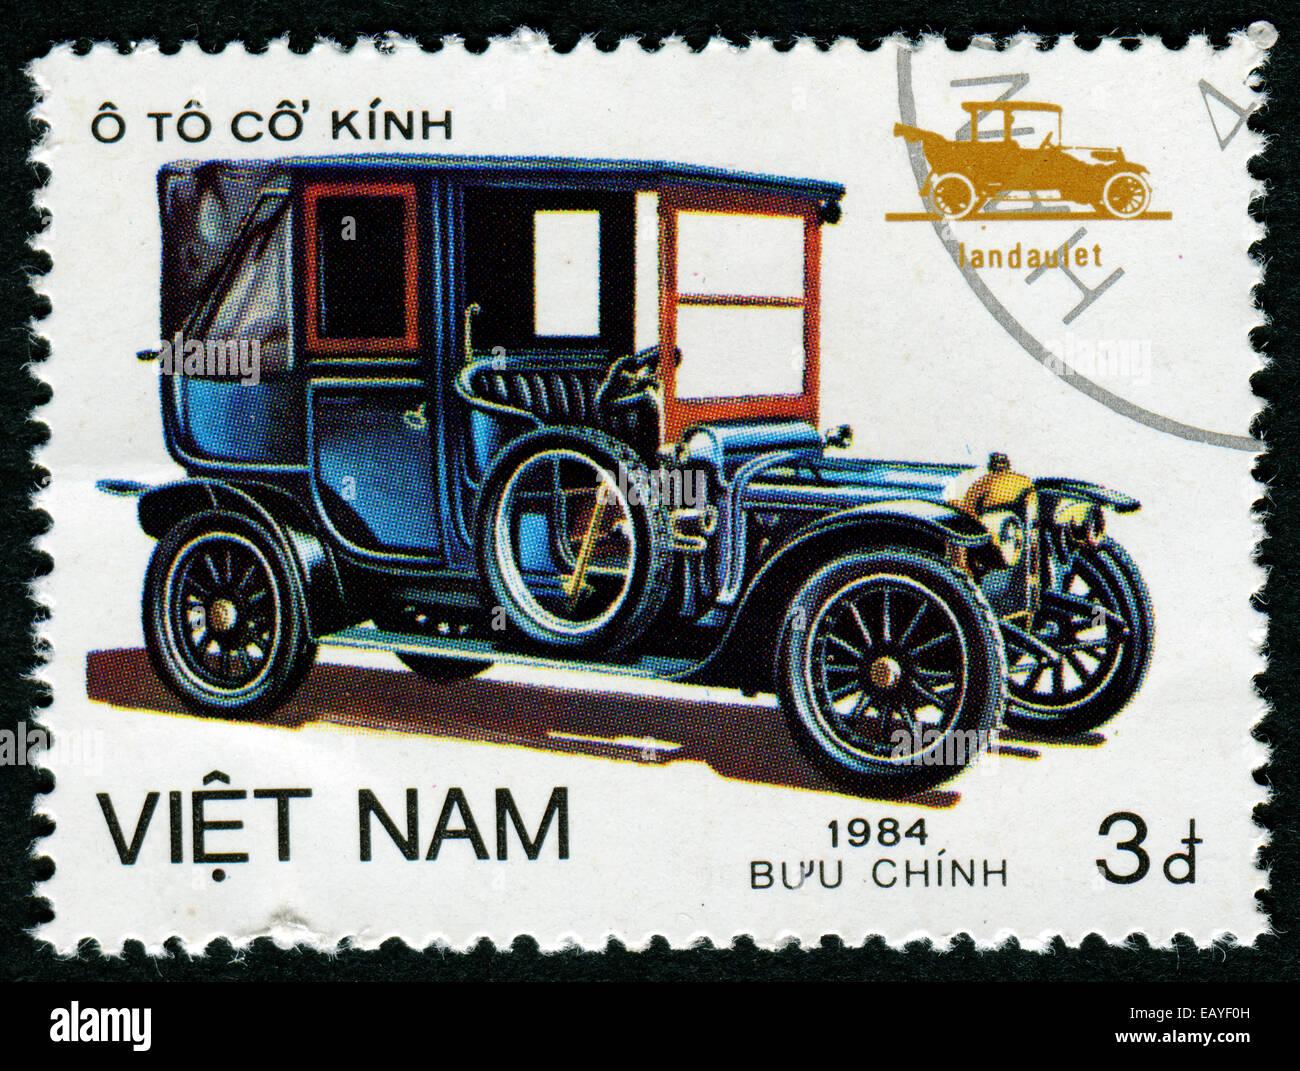 VIETNAM - CIRCA 1984: A stamp printed by VIETNAM shows old car, series, circa 1984 - Stock Image